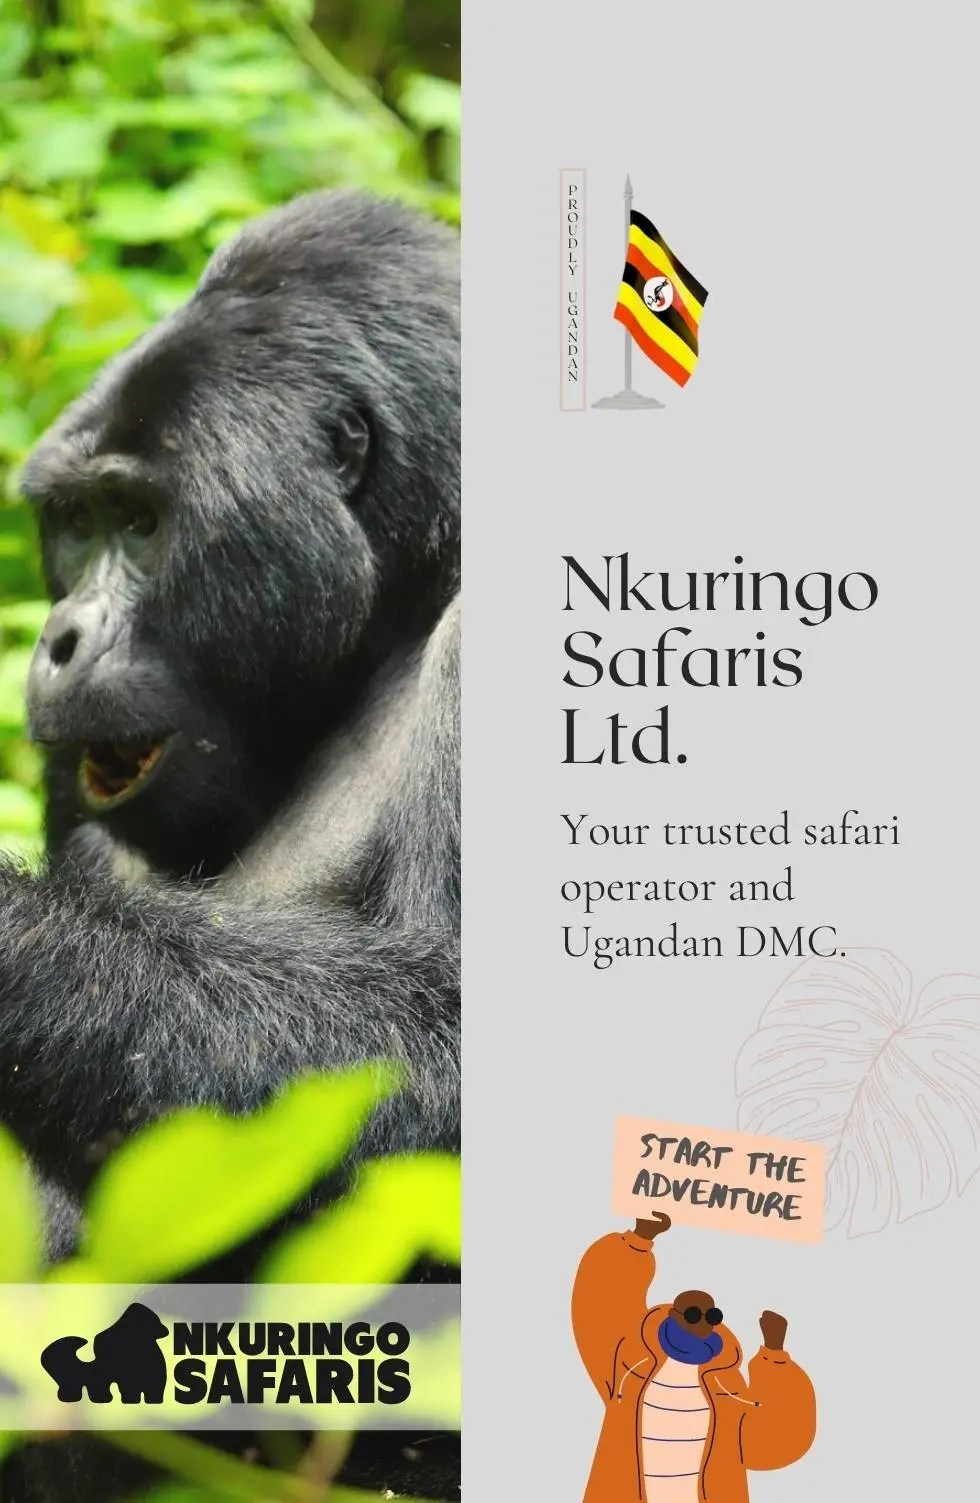 Trusted Uganda local tour operator - Nkuirngo Safaris